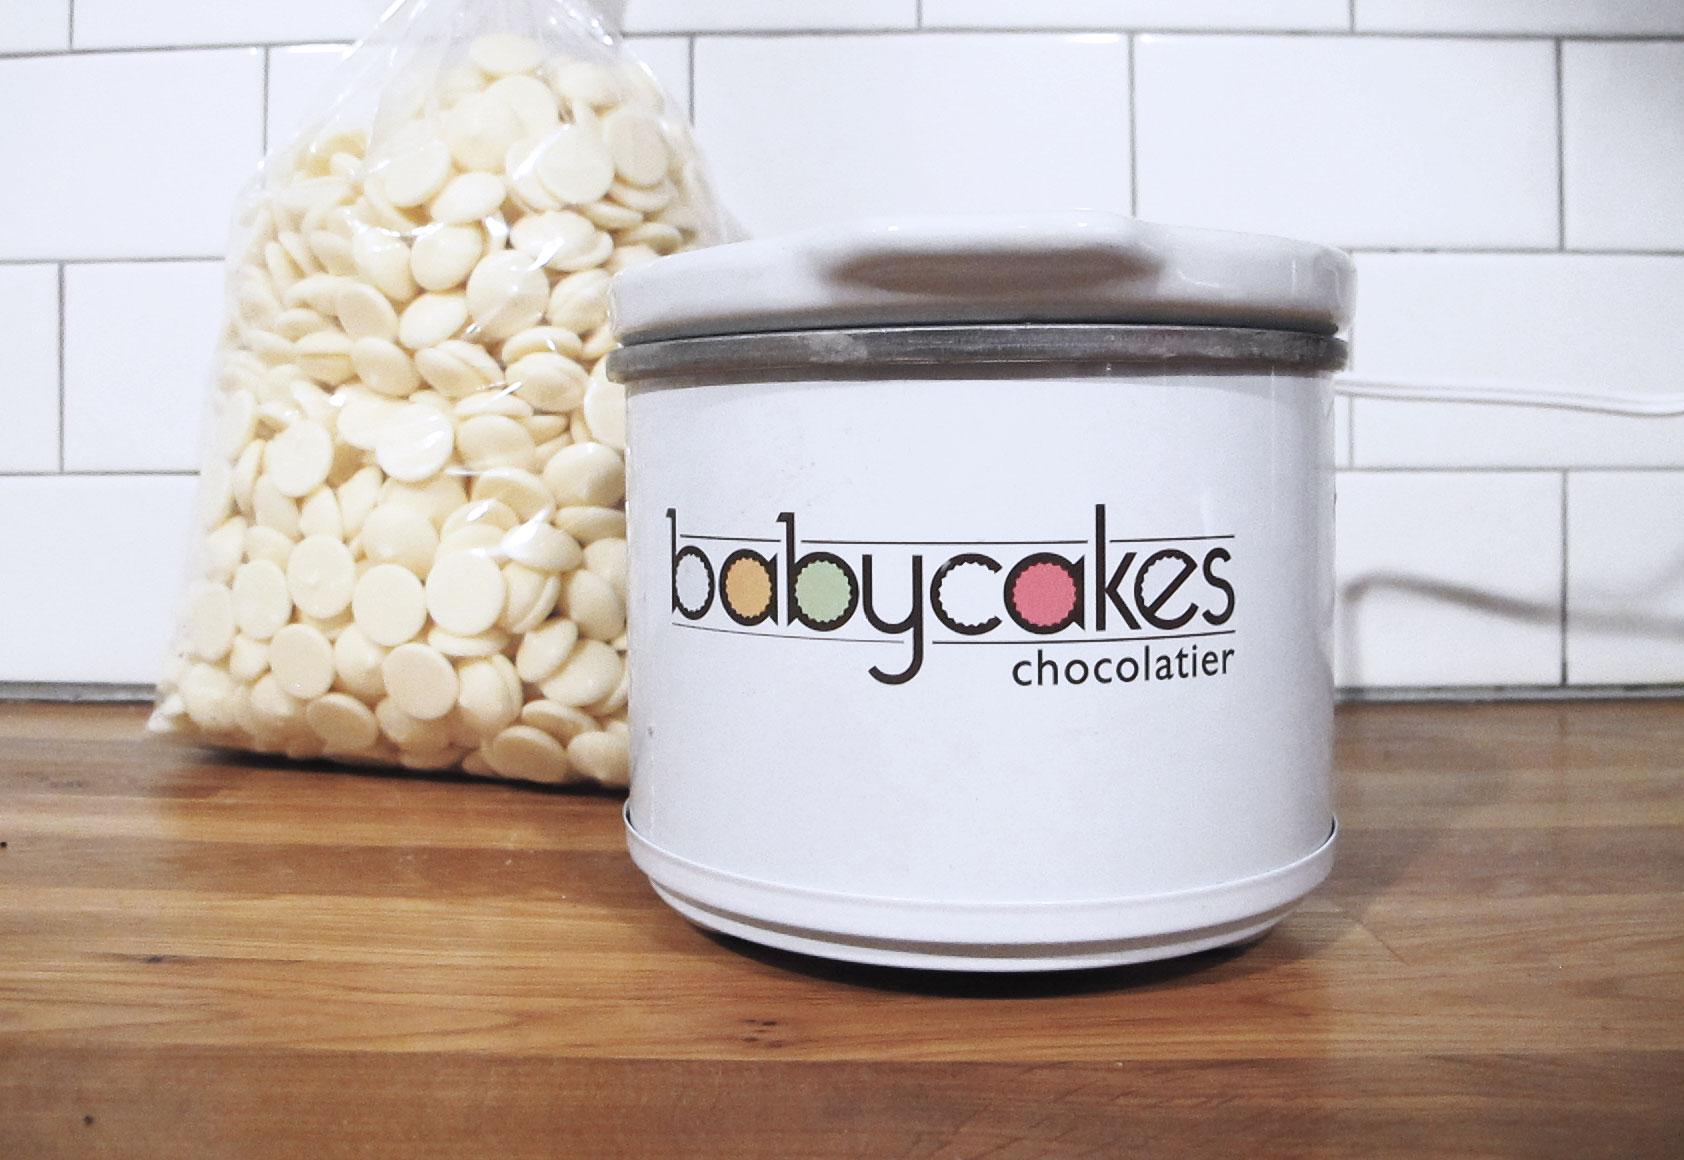 cotscolumbus_cakepops_1